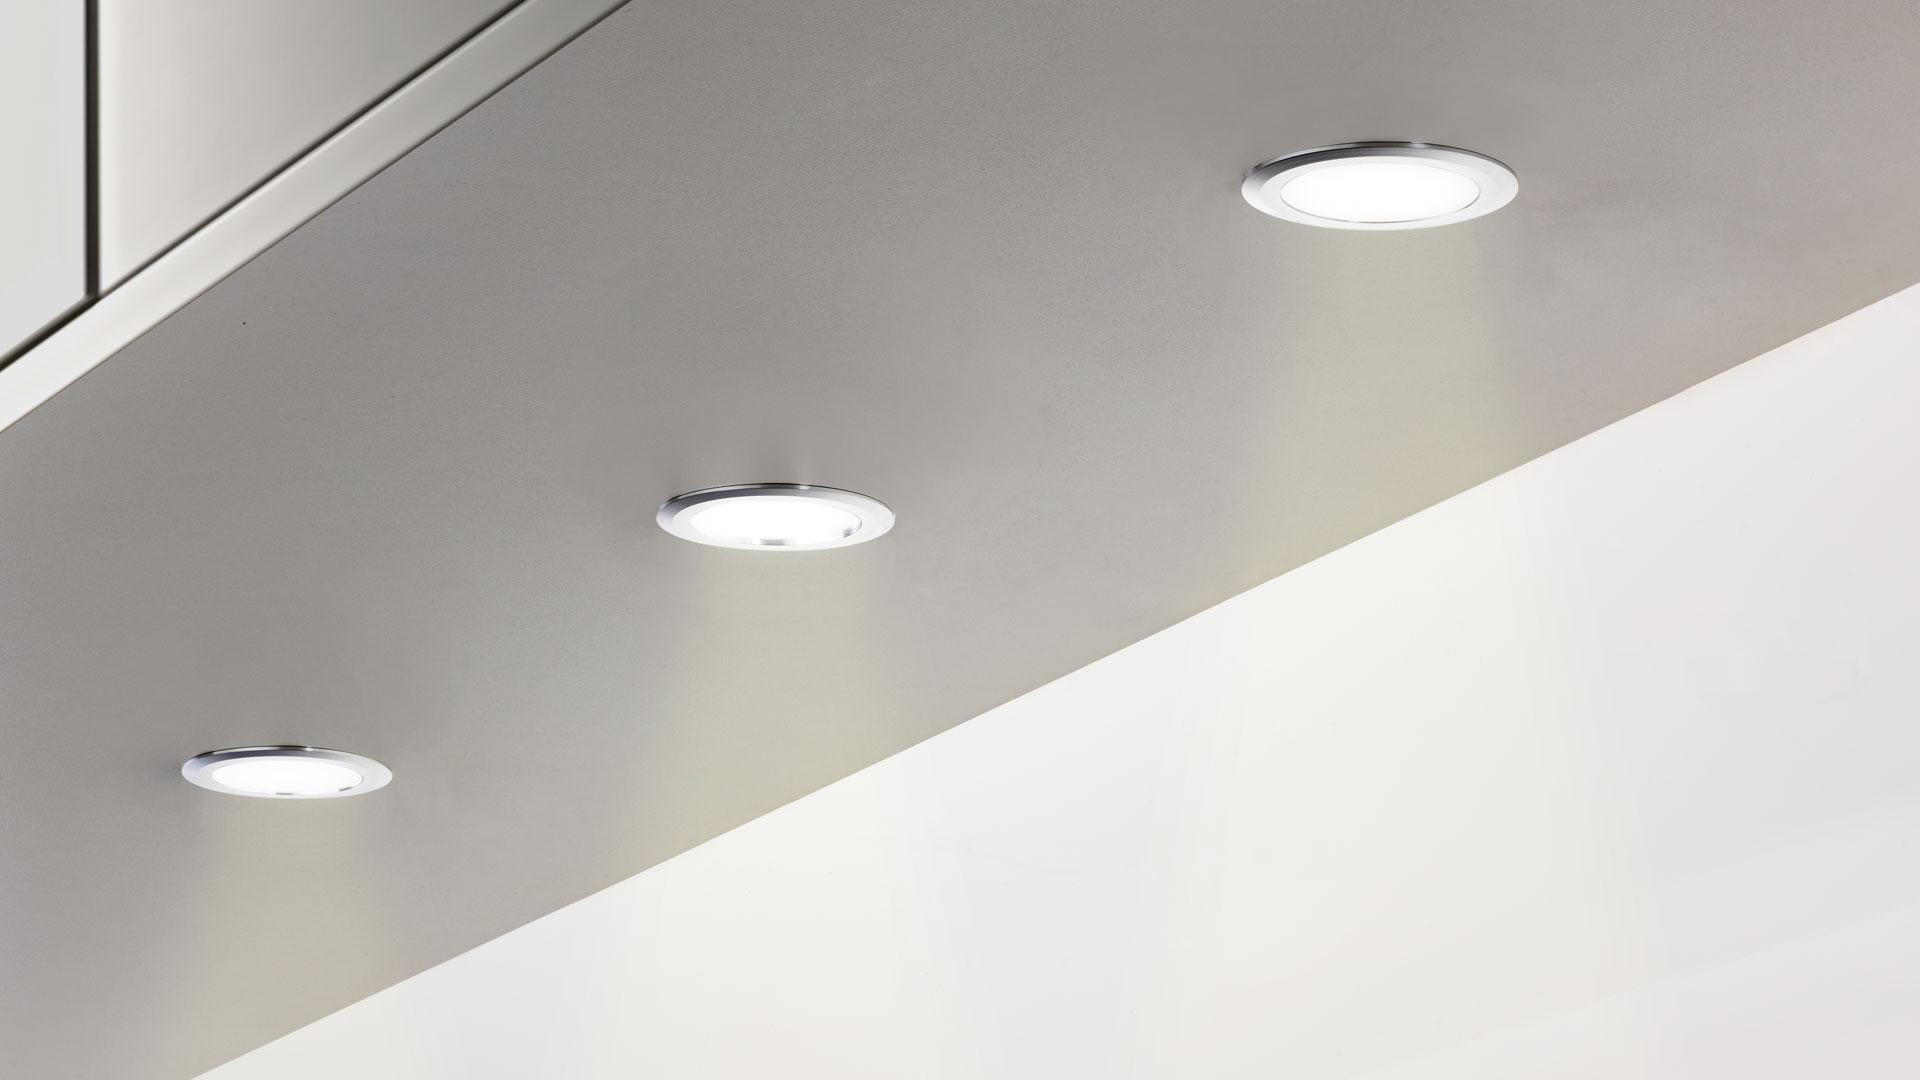 beleuchtung beleuchtung von dachschrgen with beleuchtung stunning kreative beleuchtung mit. Black Bedroom Furniture Sets. Home Design Ideas